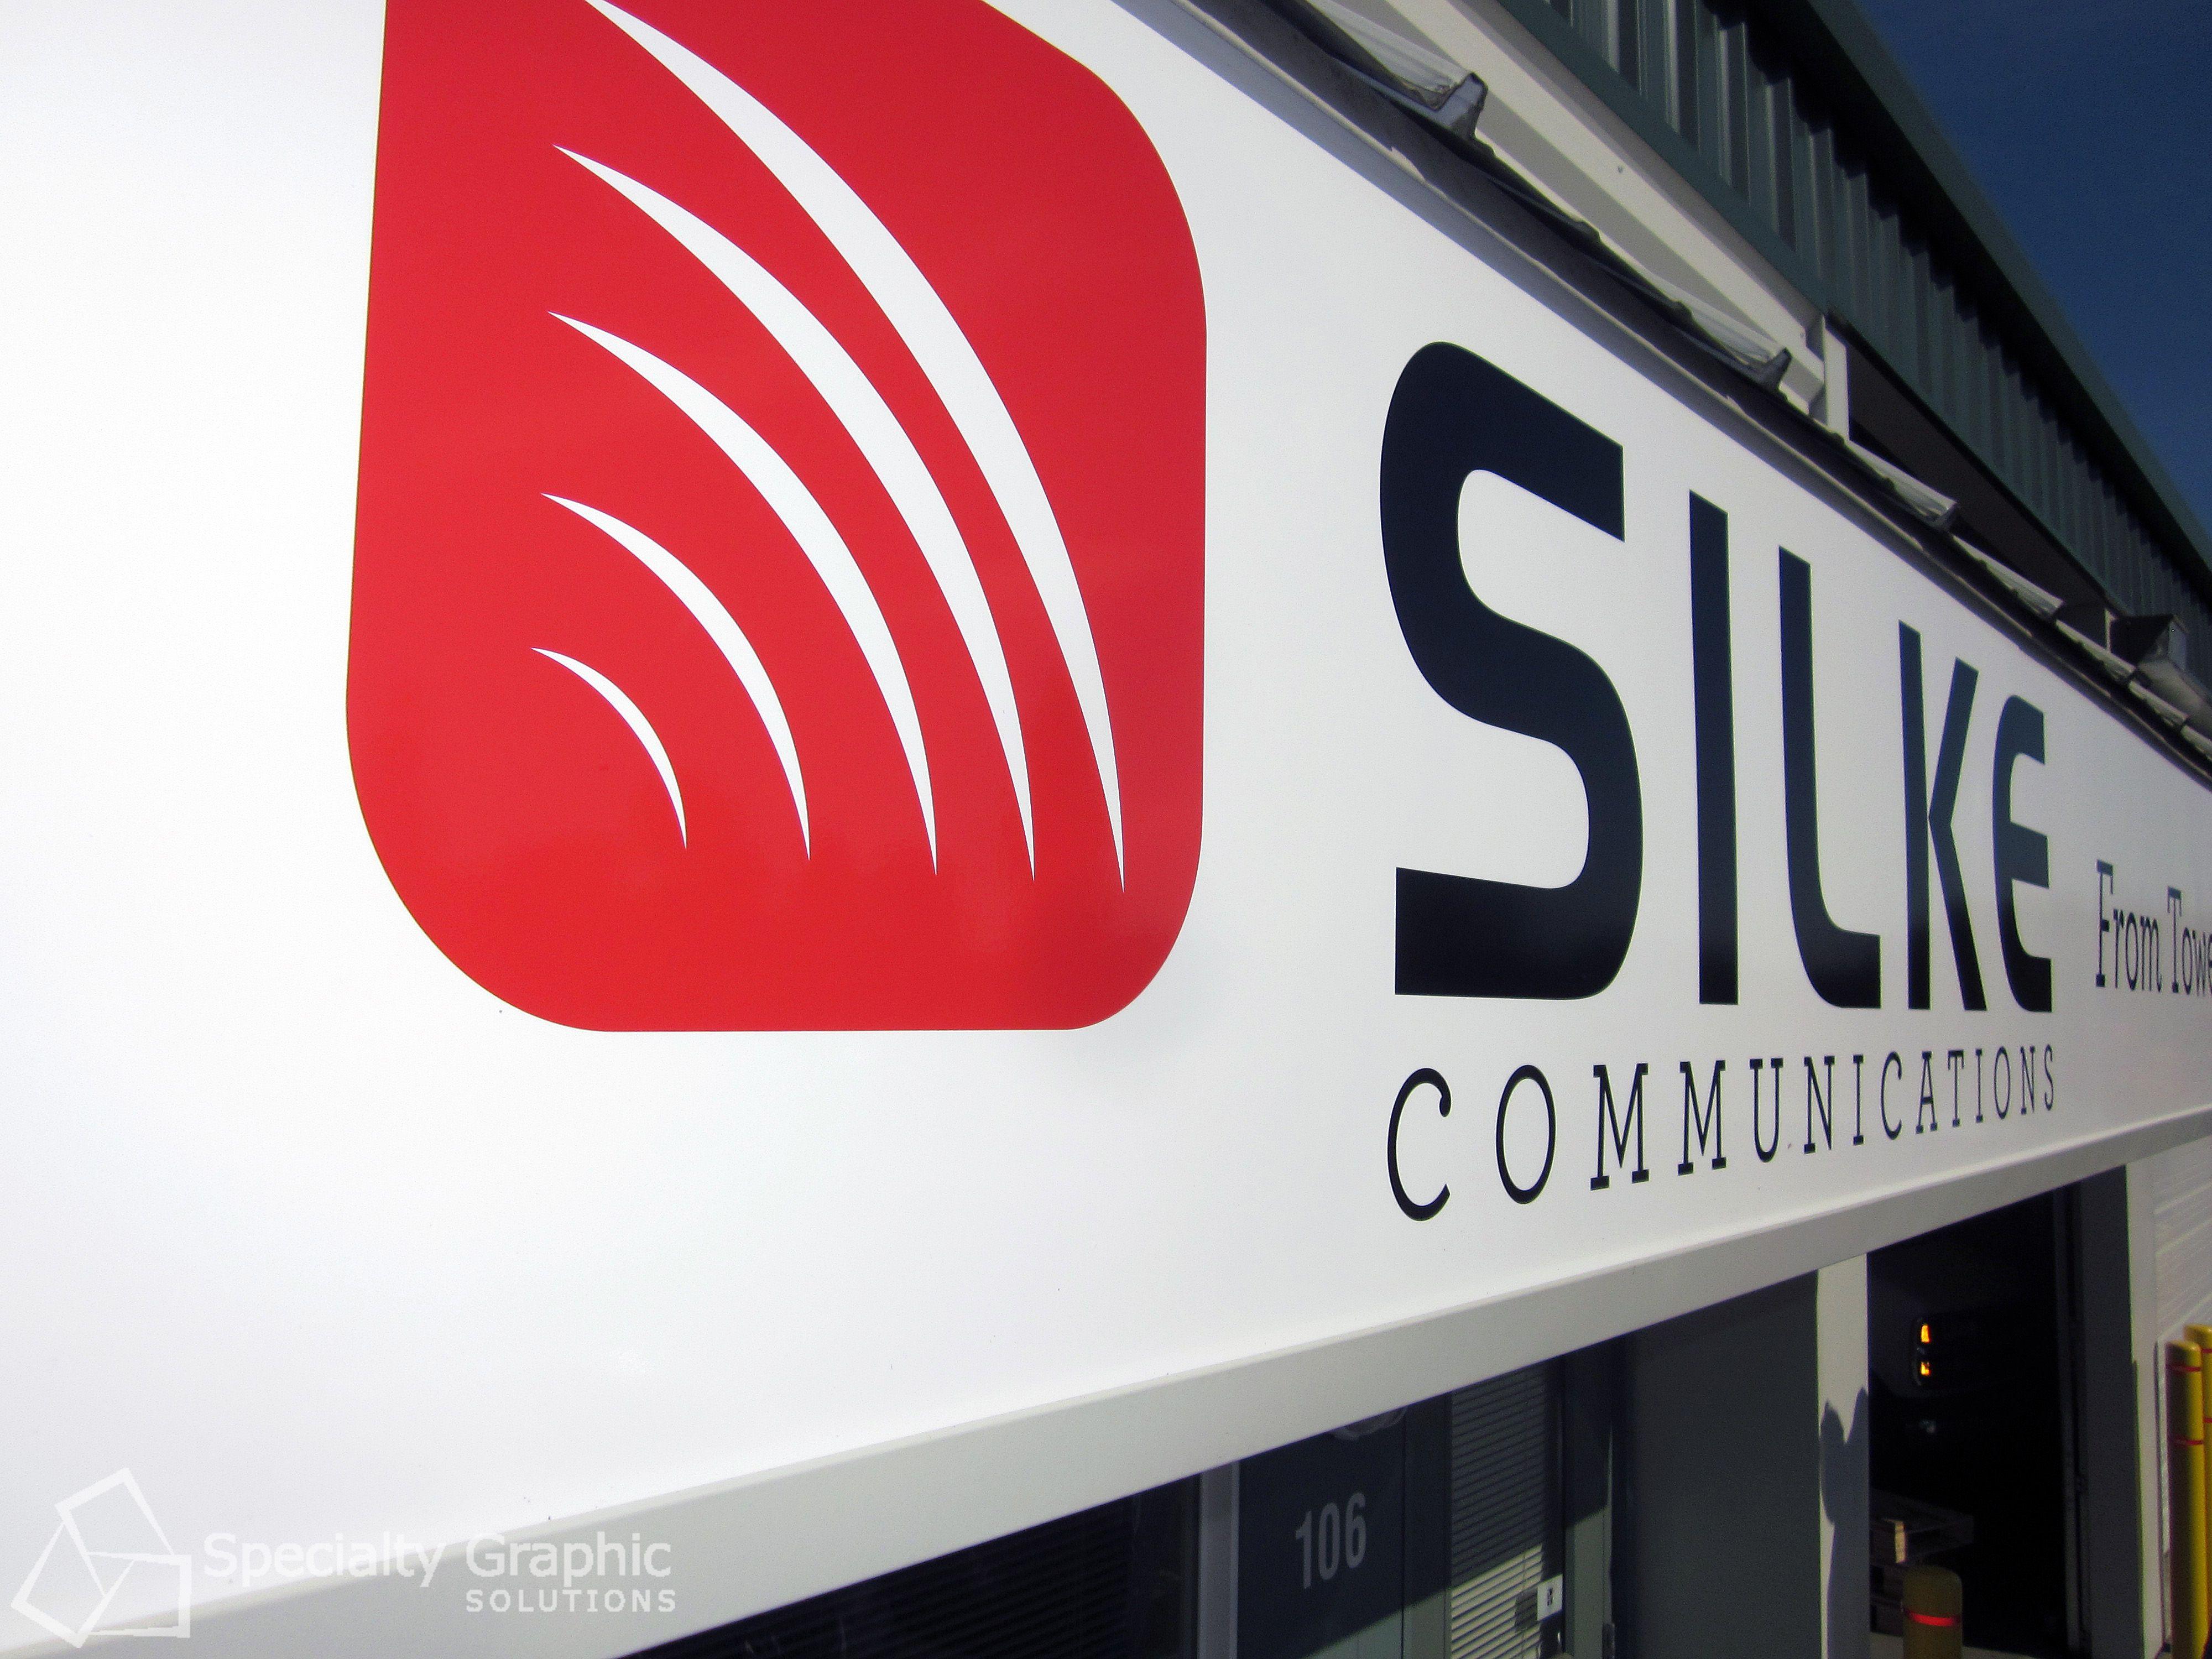 Awning Sign. Silke Communications. Vancouver WA. #signs # ...